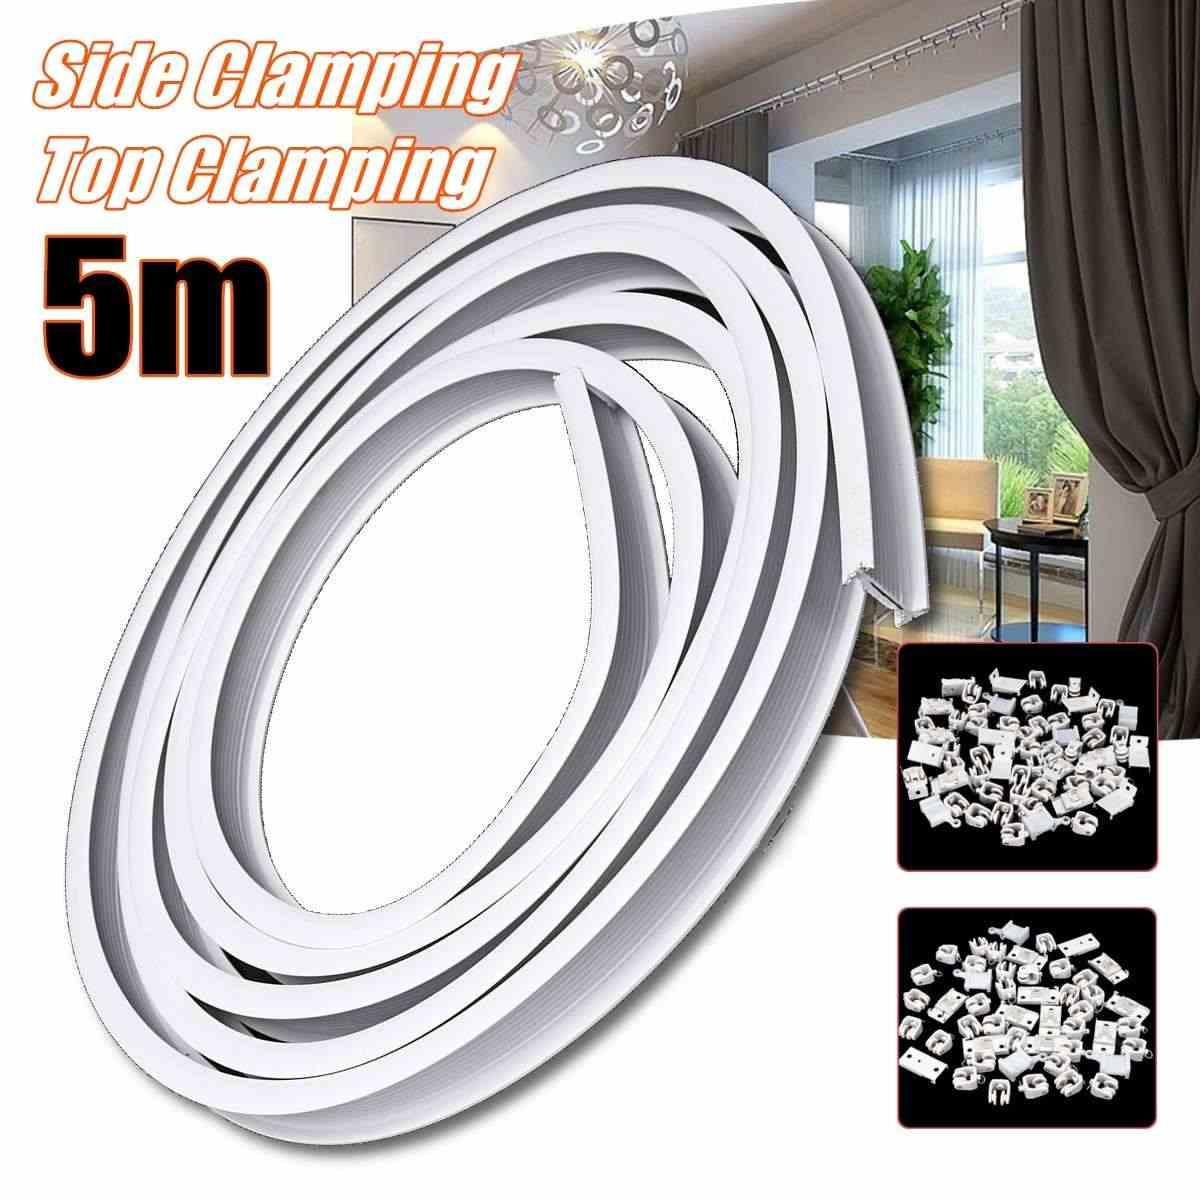 5m flexible ceiling mounted curtain track rail straight slide windows balcony plastic bendable home window decor accessories